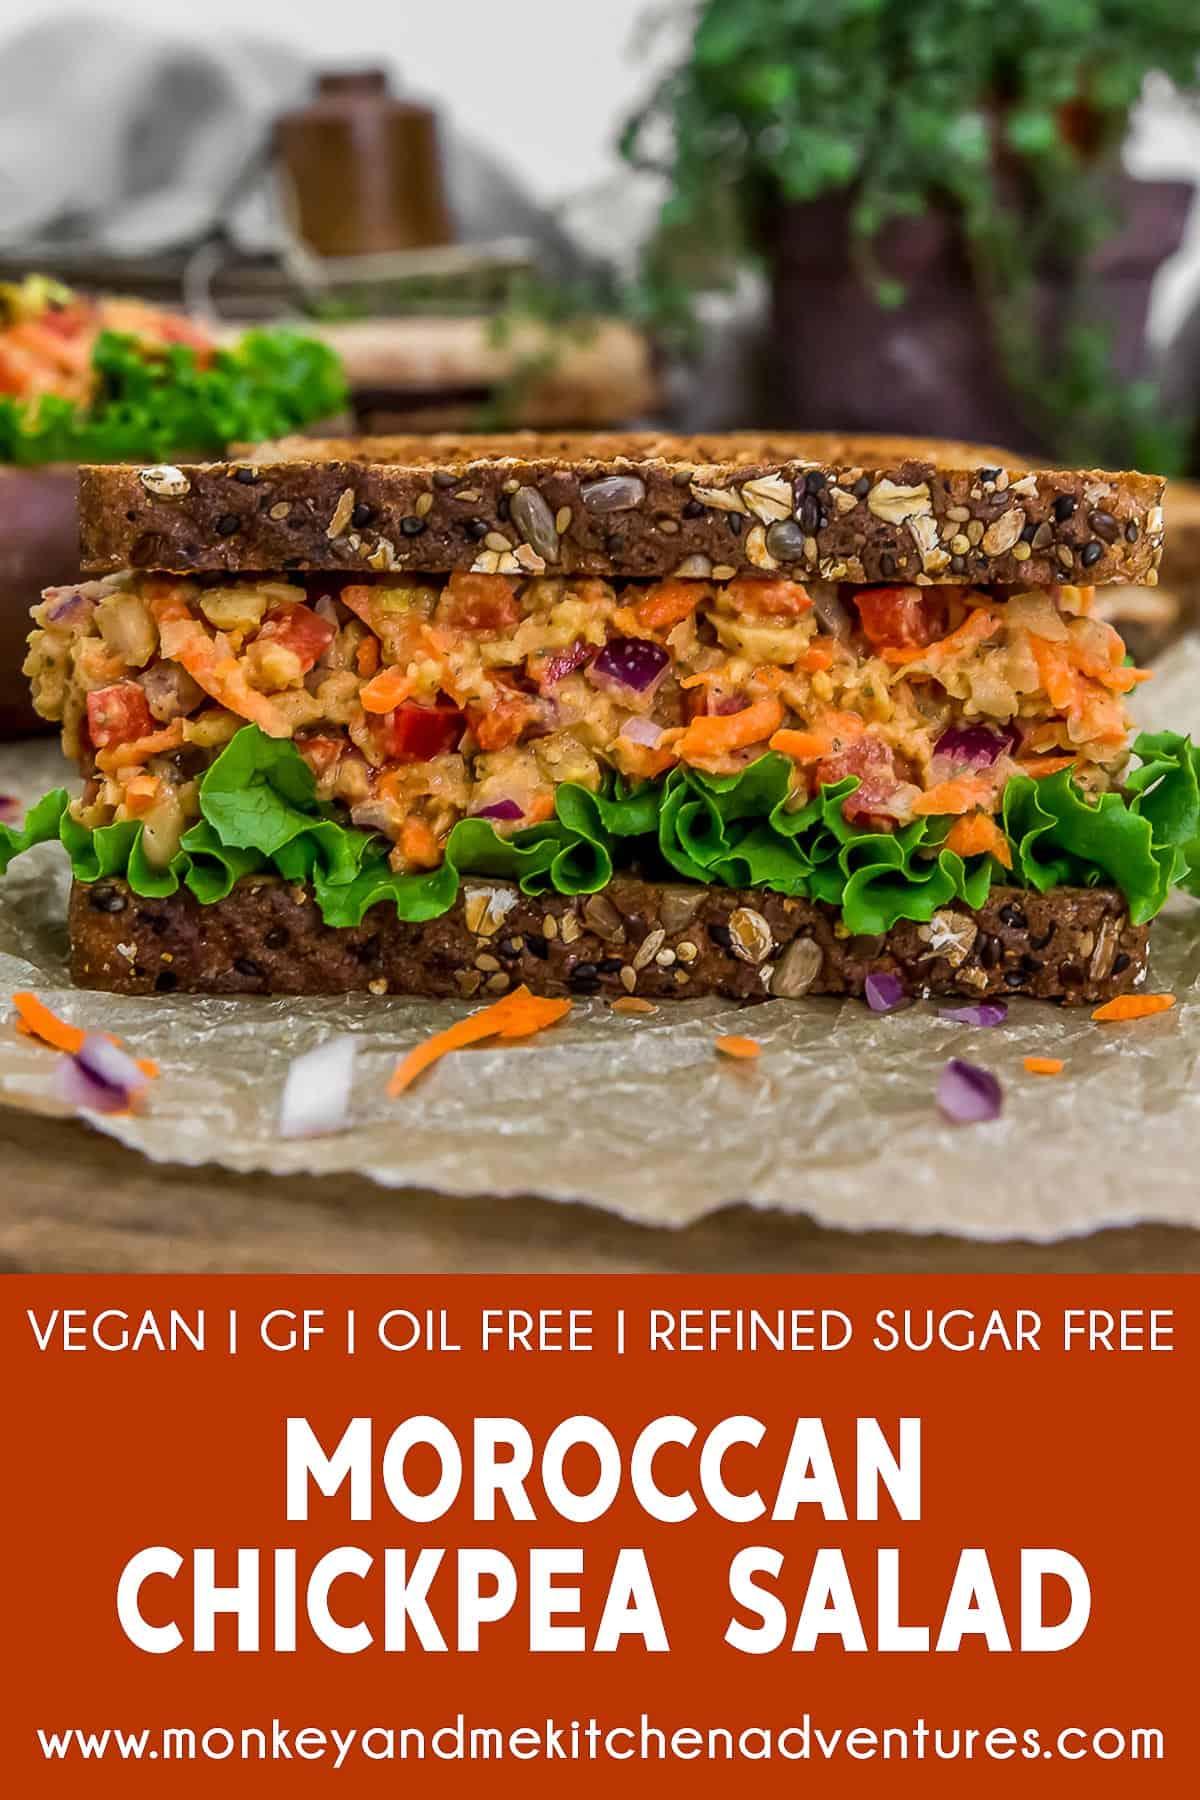 Moroccan Chickpea Salad with text description